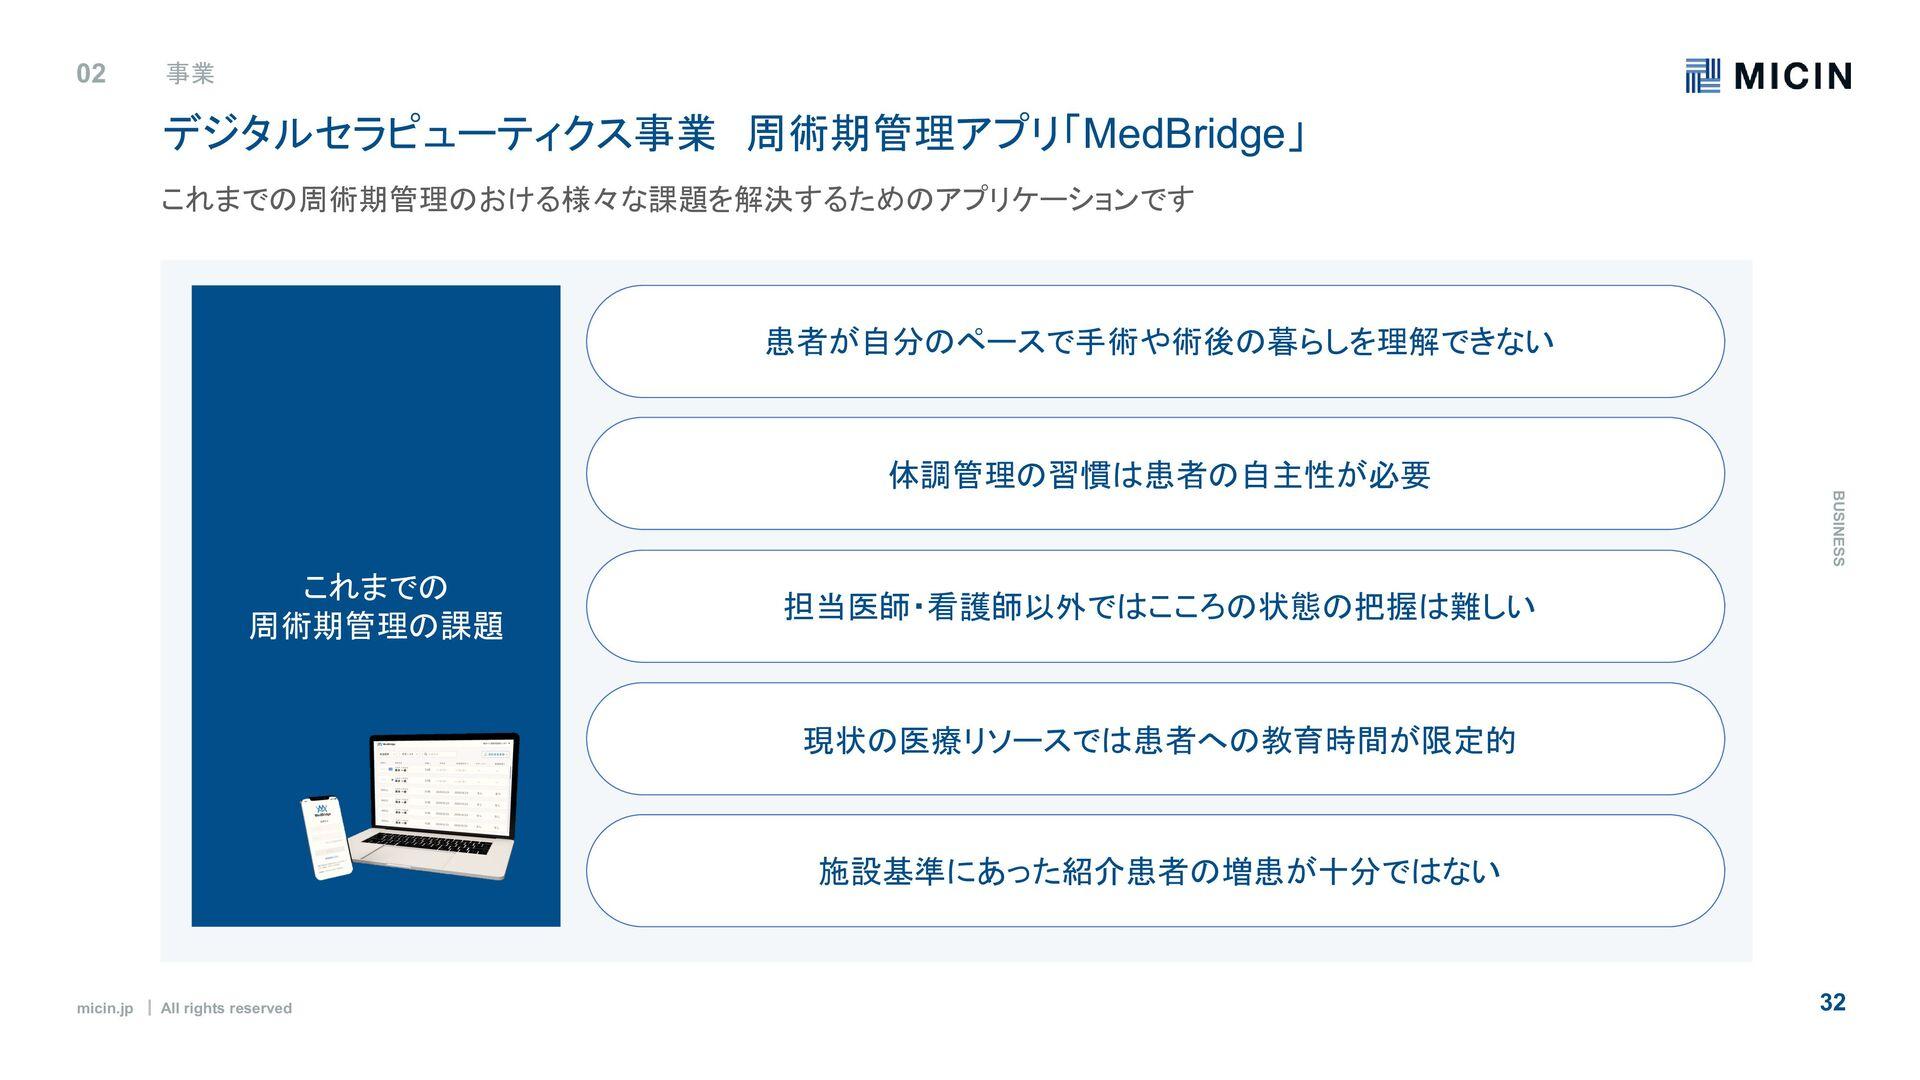 micin.jp   All rights reserved 3 2 micin.jp   A...